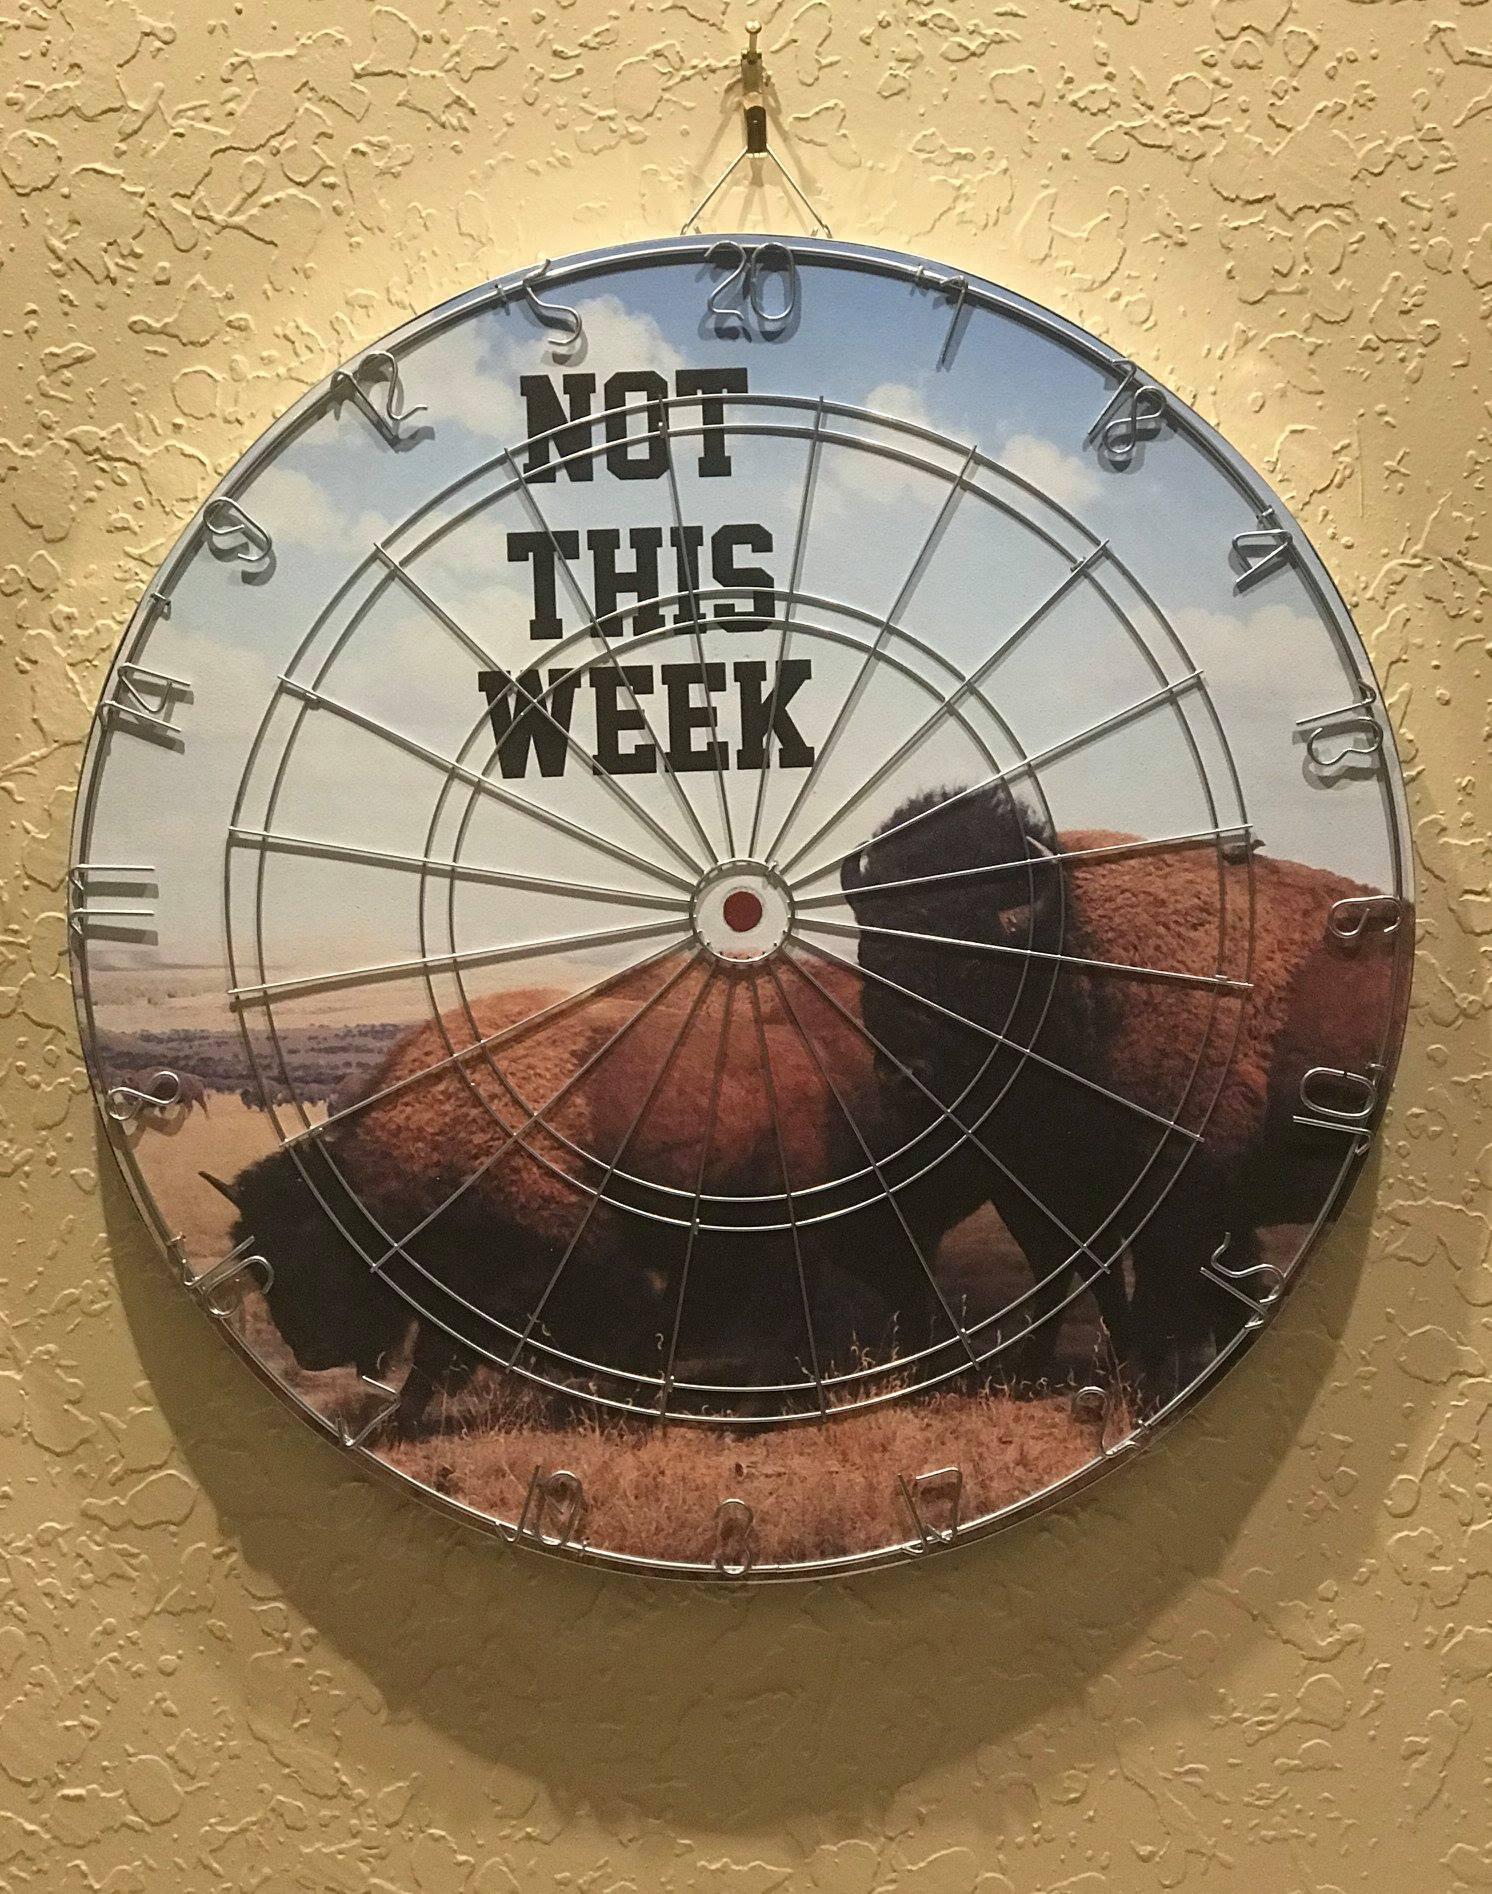 dart board of buffalos not this week